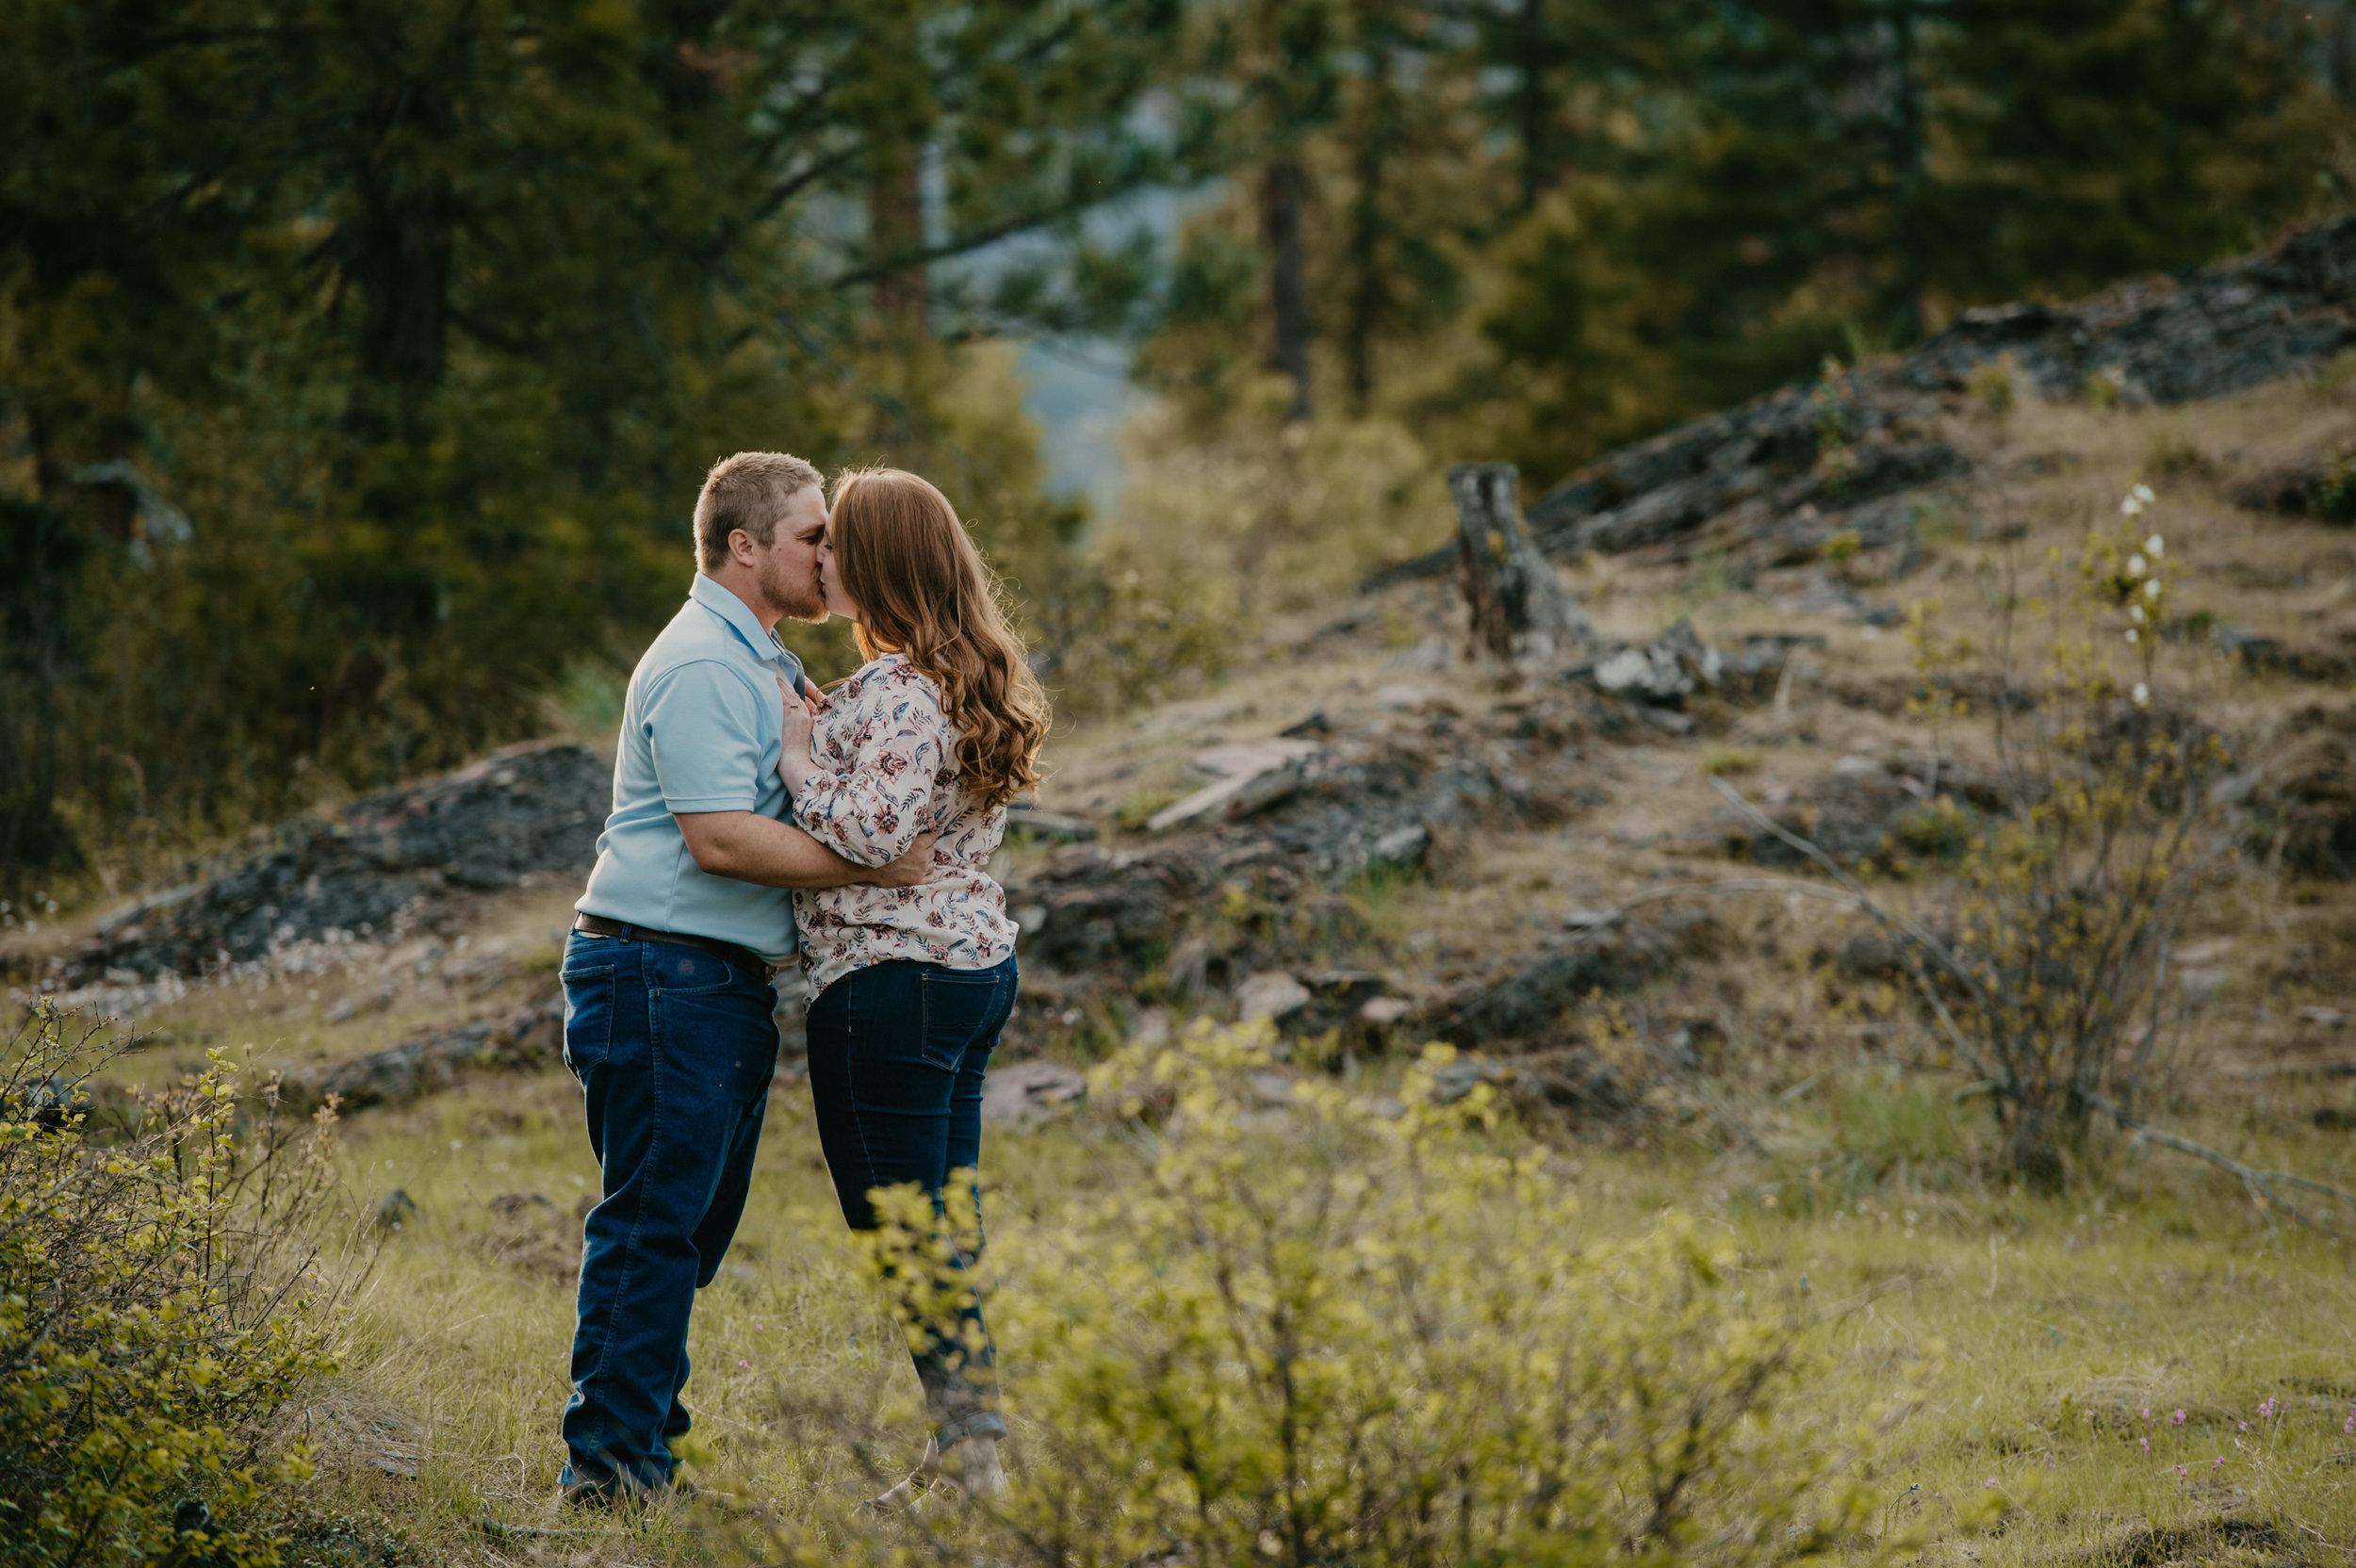 027White Raven Engagement Session_Megan & Justin_Honeybee Weddings_May 10, 2019-676.jpg